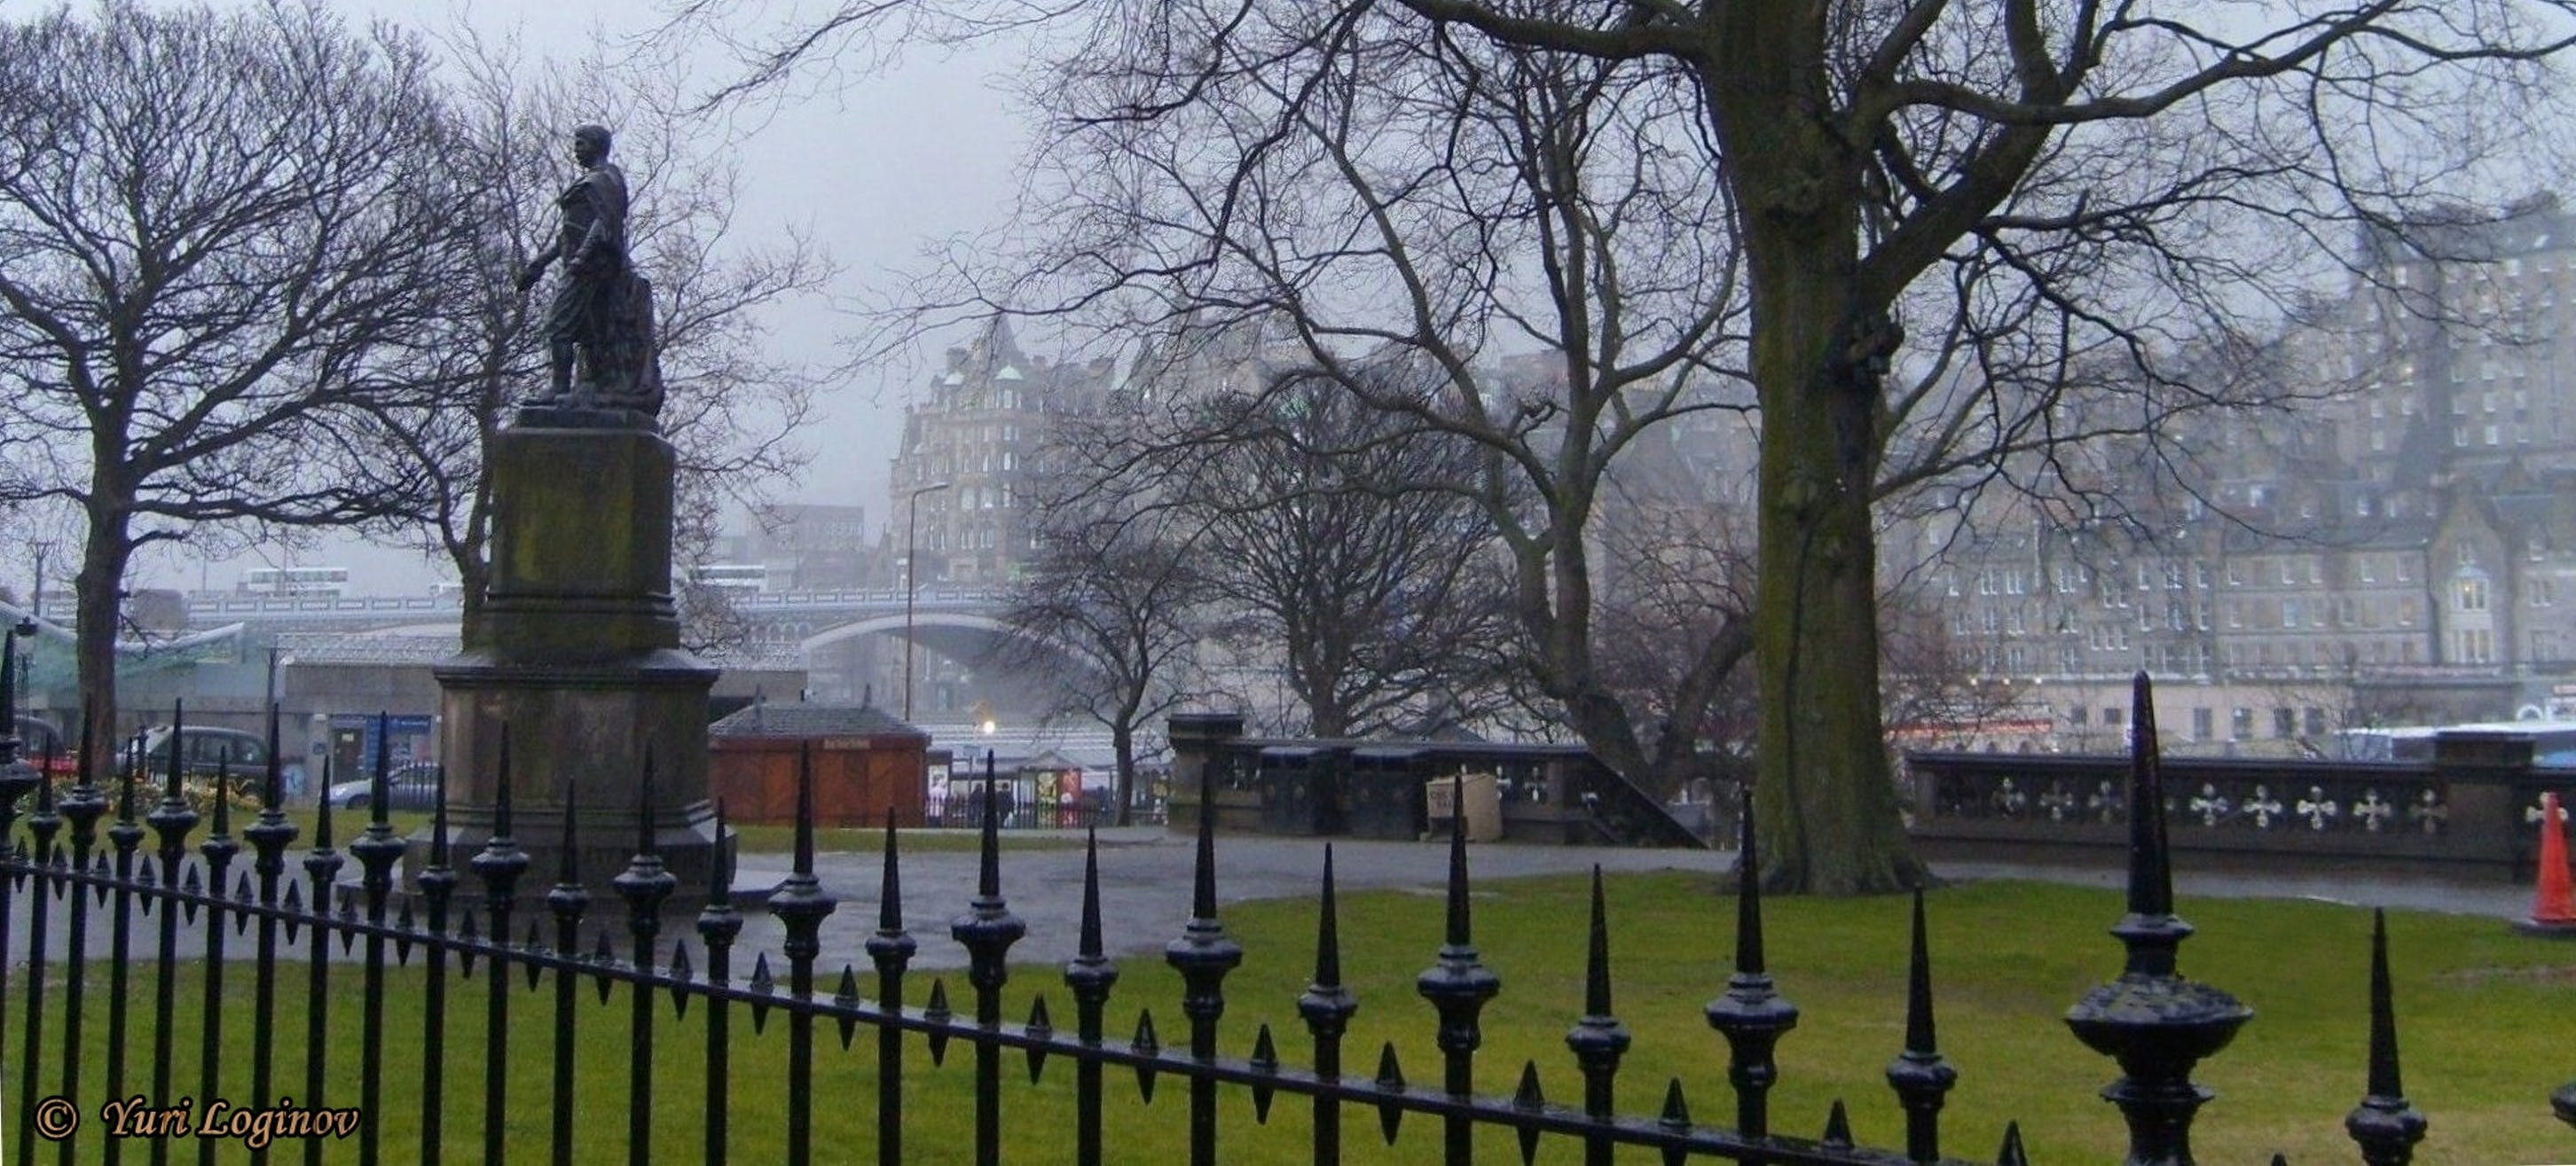 Free stock photo of scotland, edinburgh, united kingdom